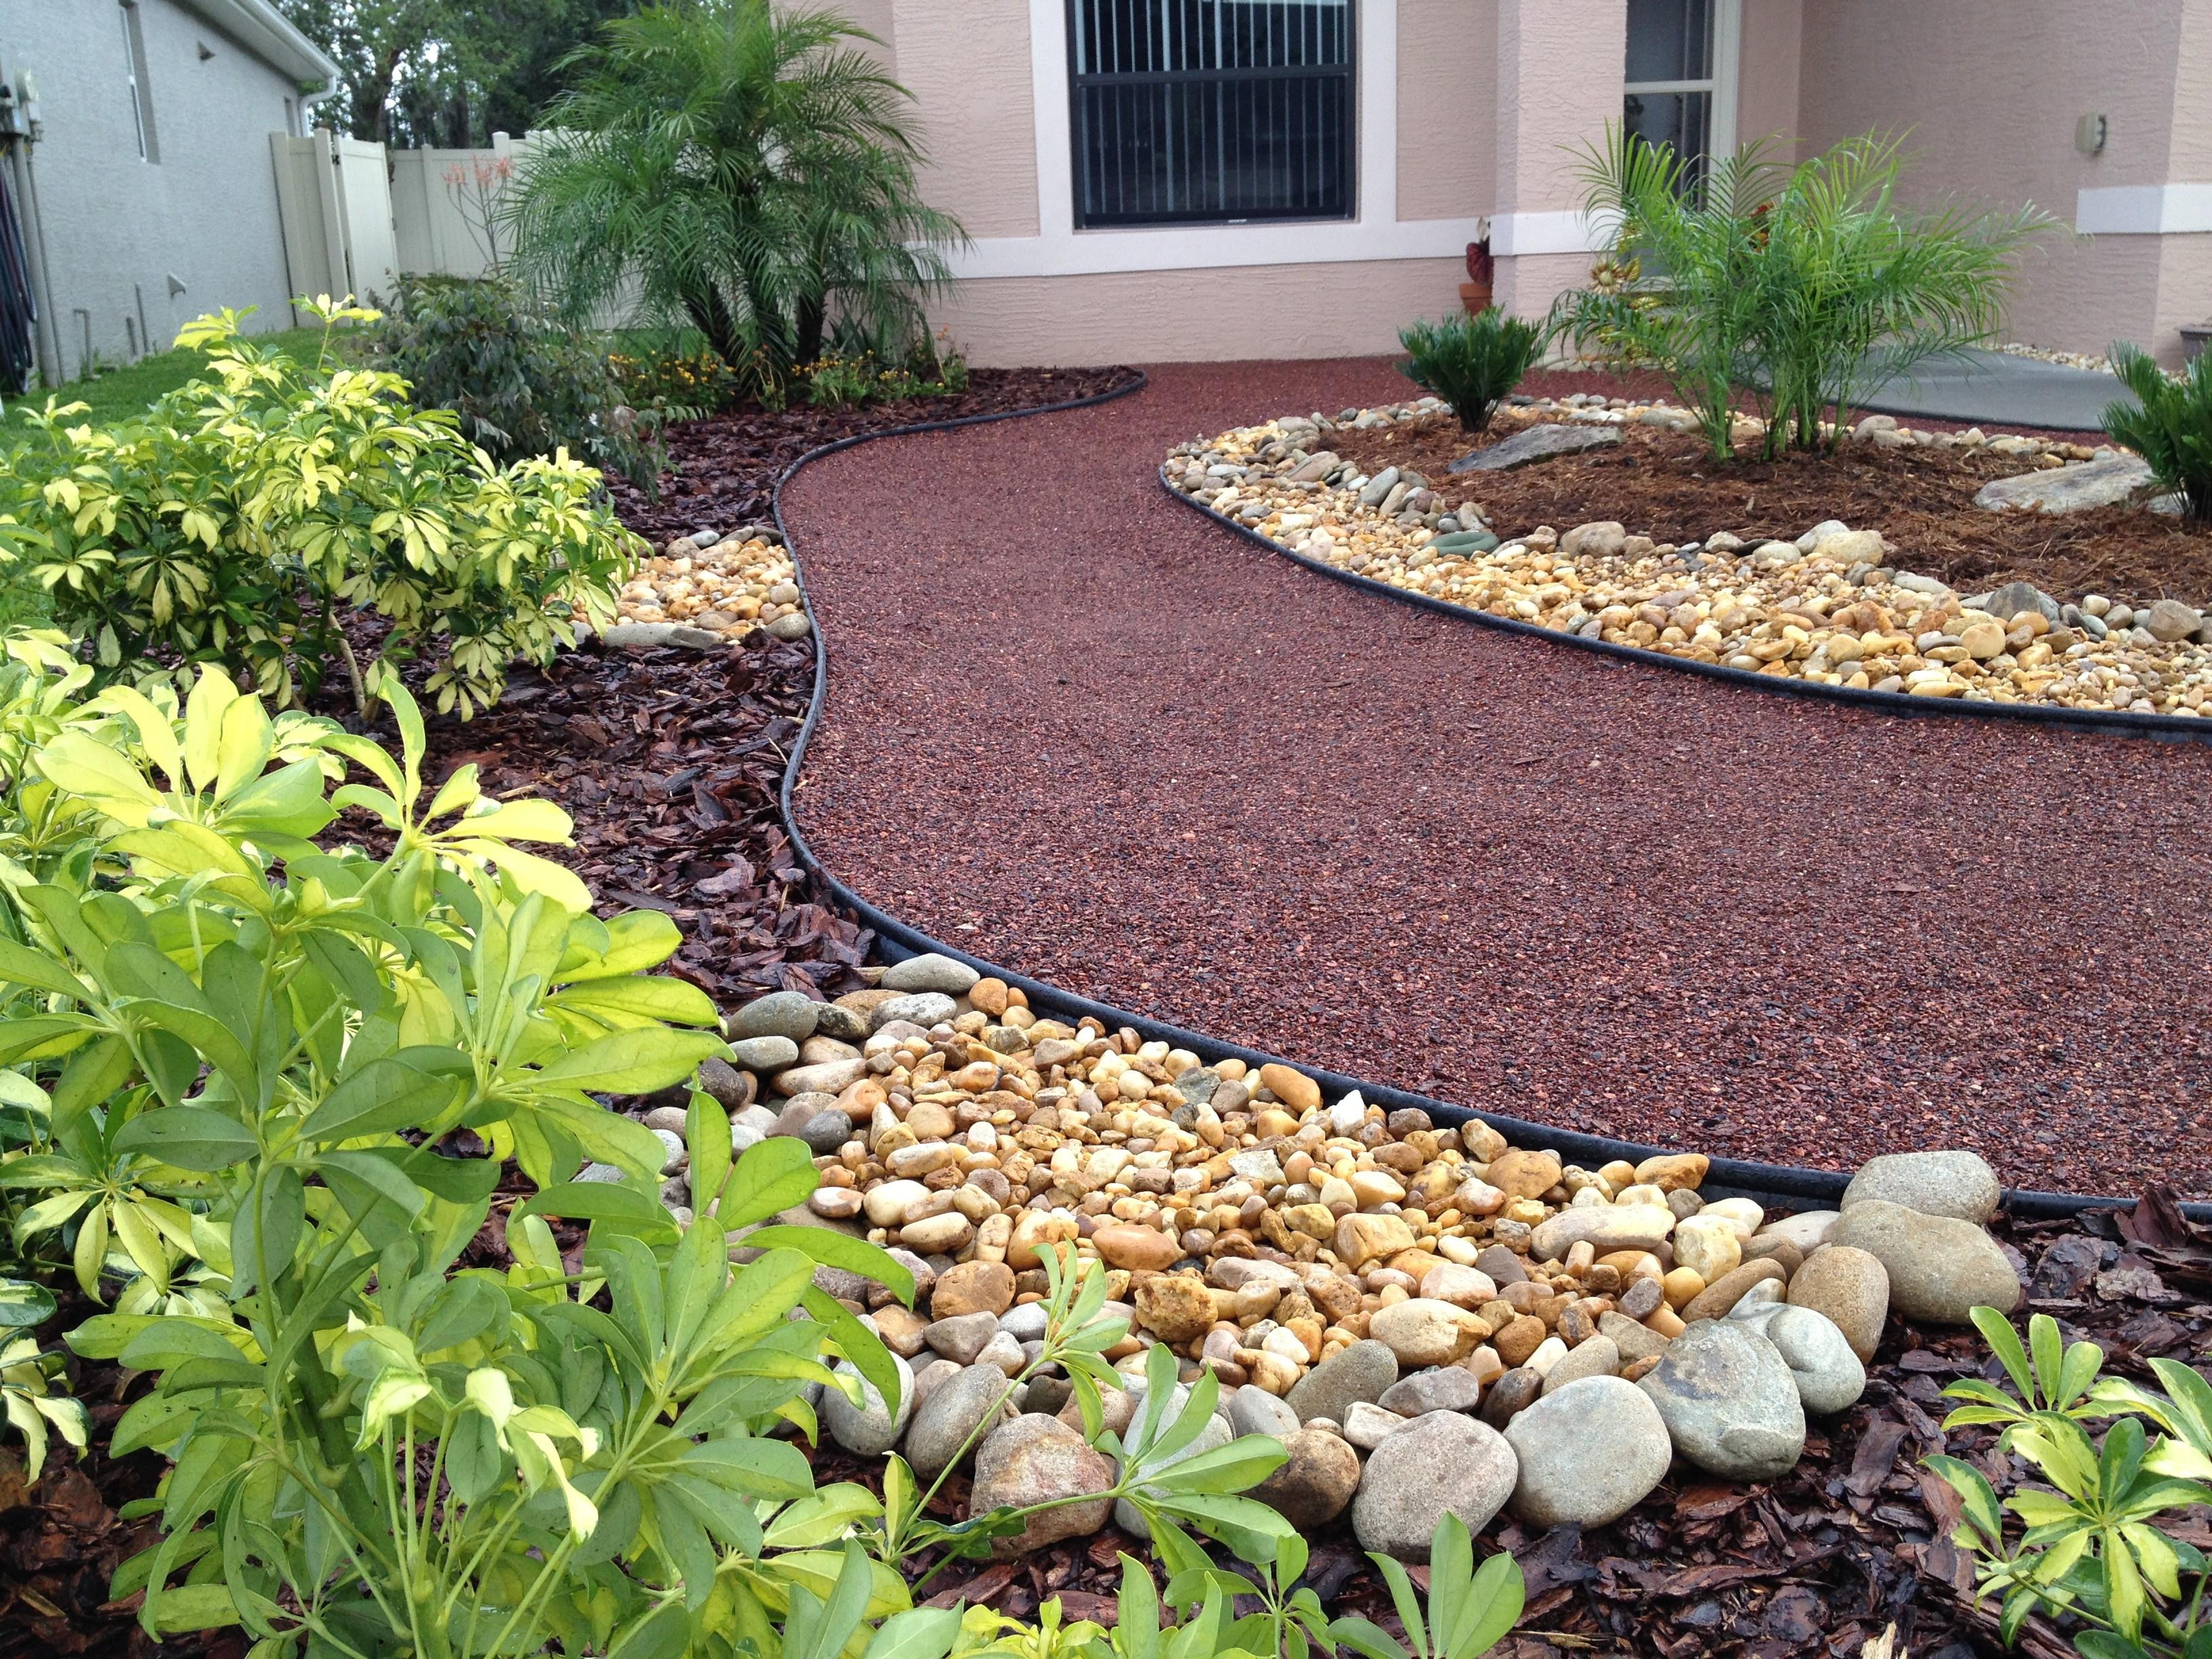 Best ideas about Diy Landscape Design . Save or Pin Diy Landscape Design For Beginners Elly s DIY Blog Now.